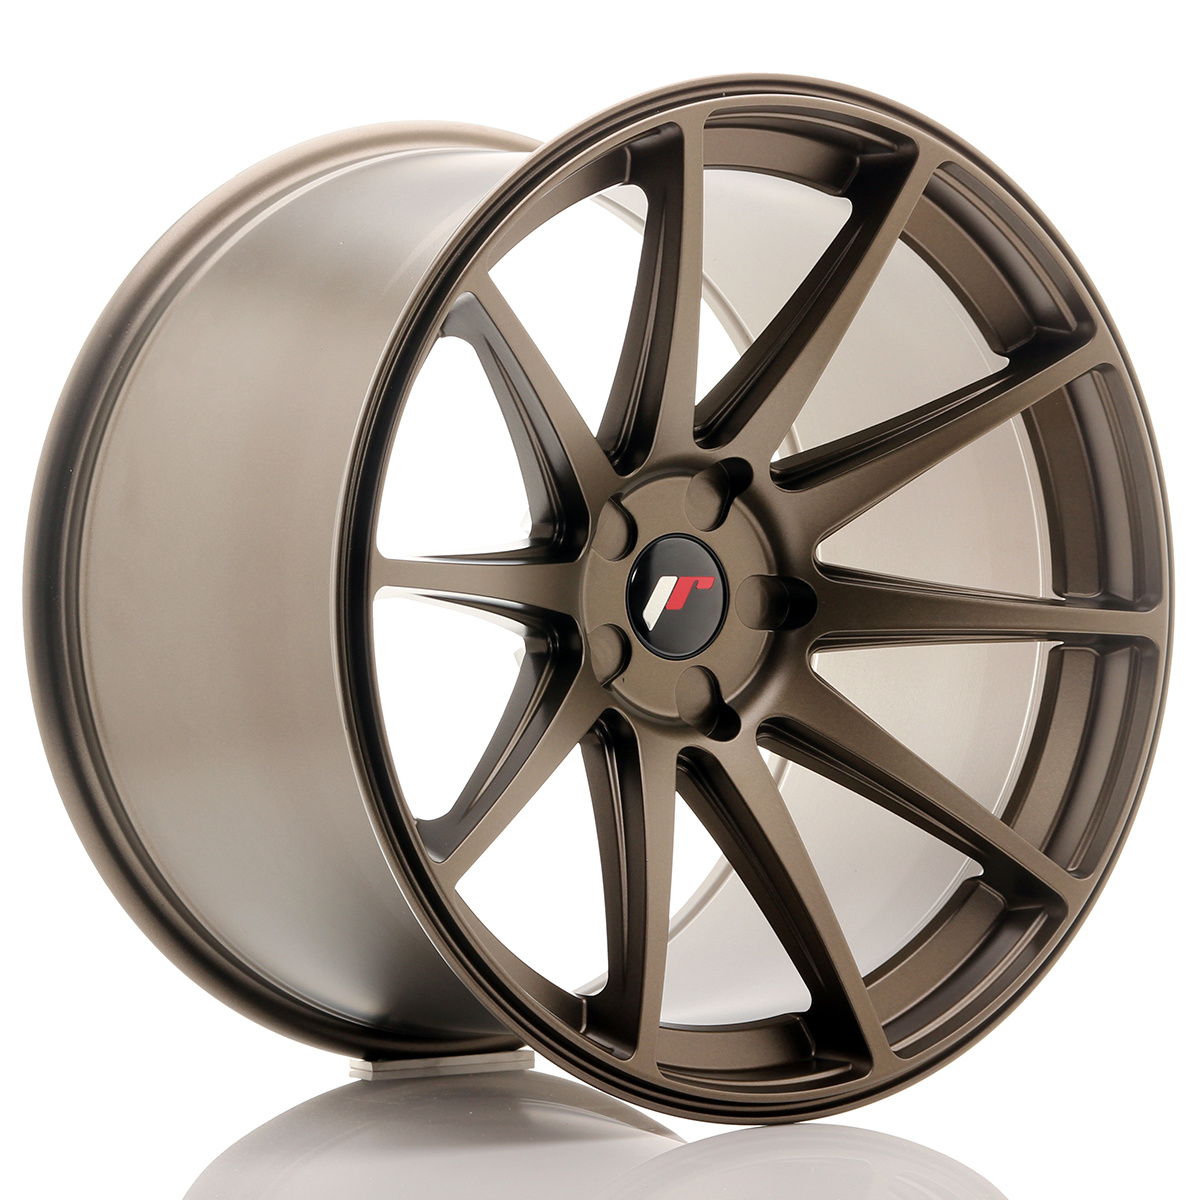 Japanracing Wheels JR11  7,25 x 17 - 9,75 x 17  ohne TGA /Festigkeit.